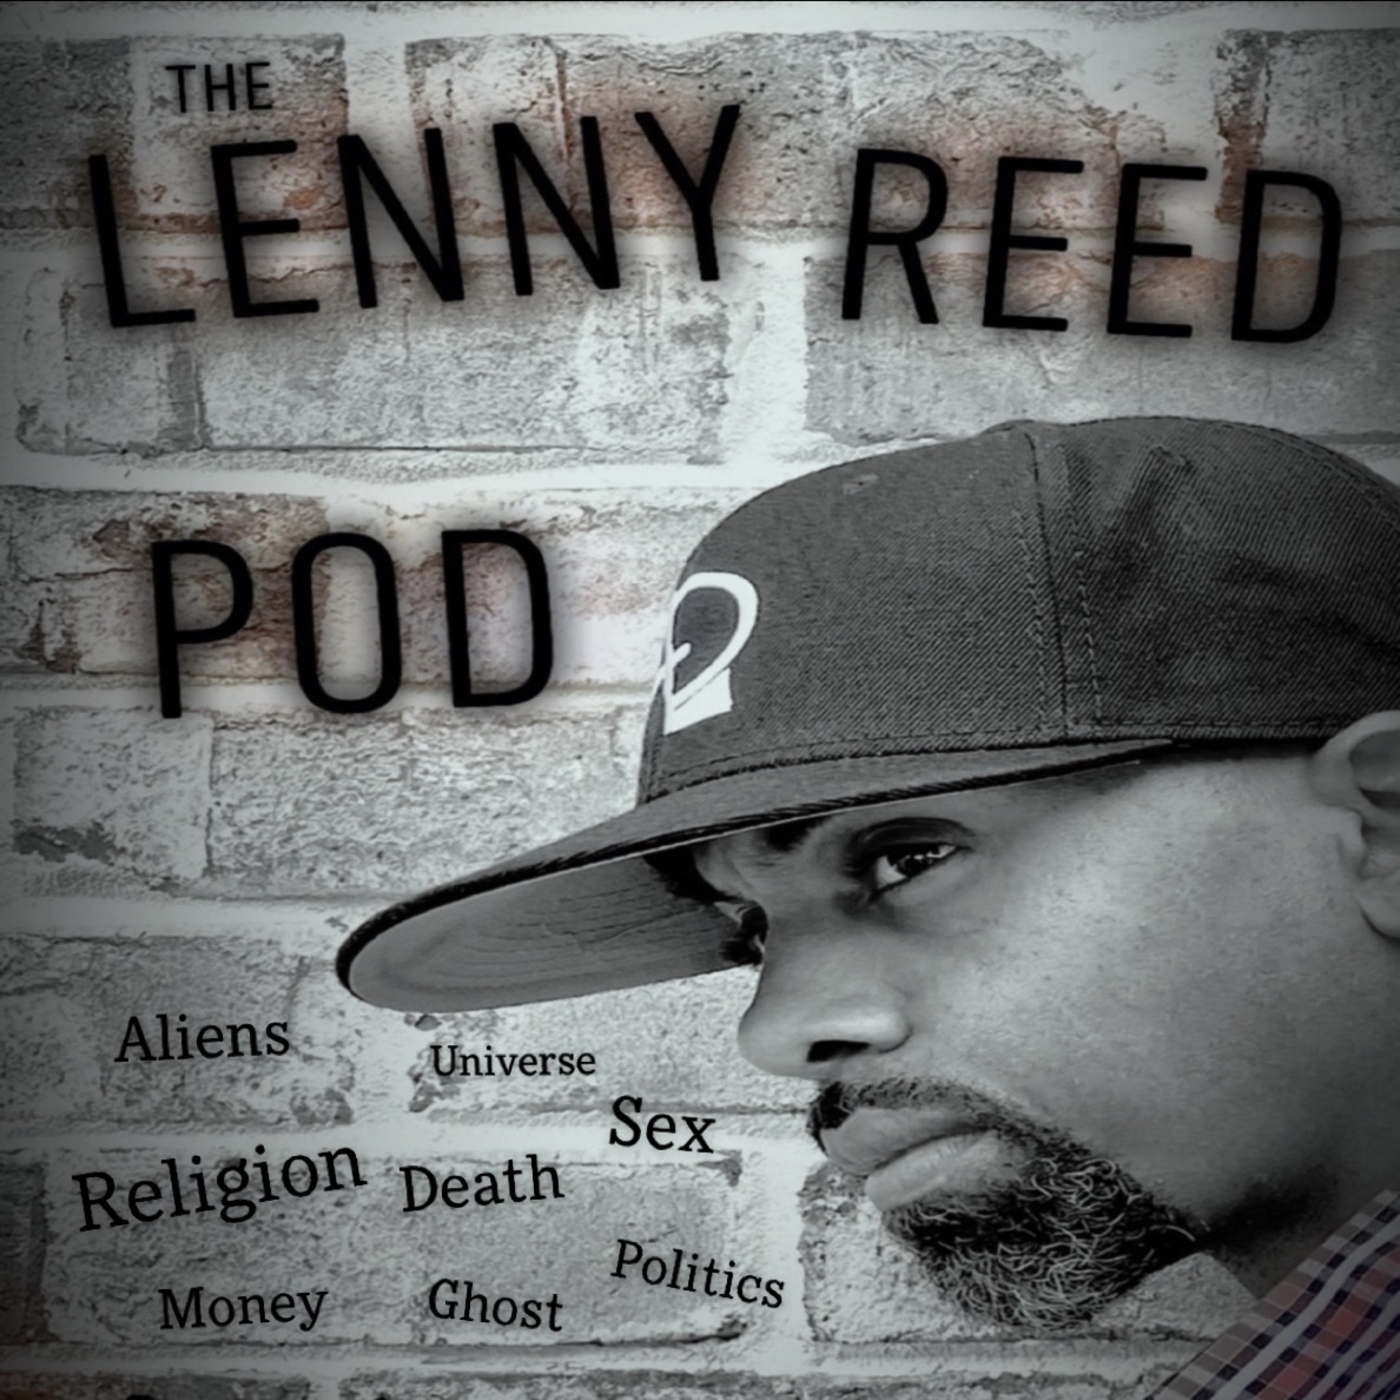 The Lenny Reed Pod show art